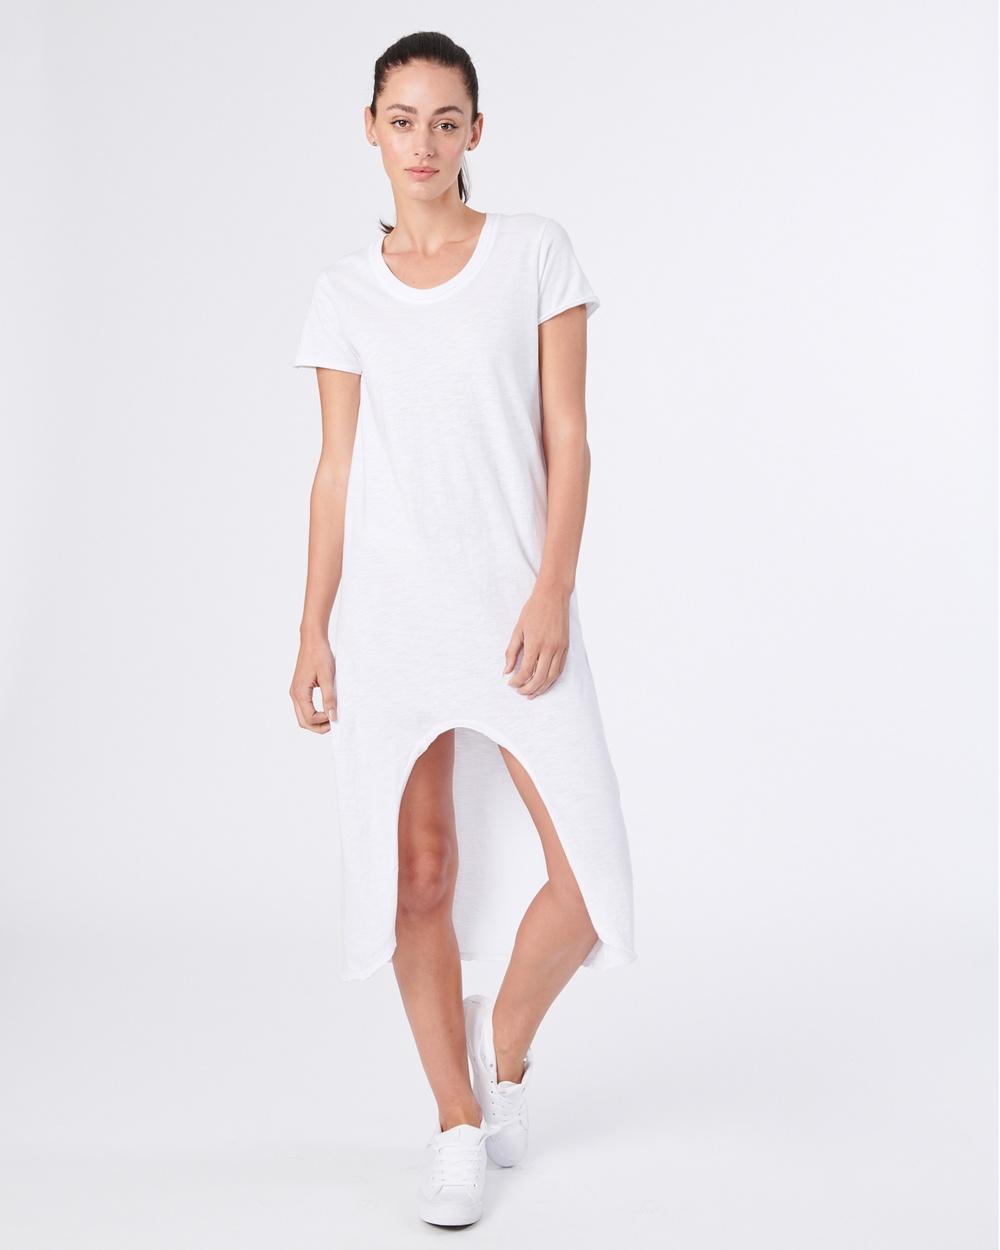 jac + mooki Maisie Dress Dresses white Maisie Dress